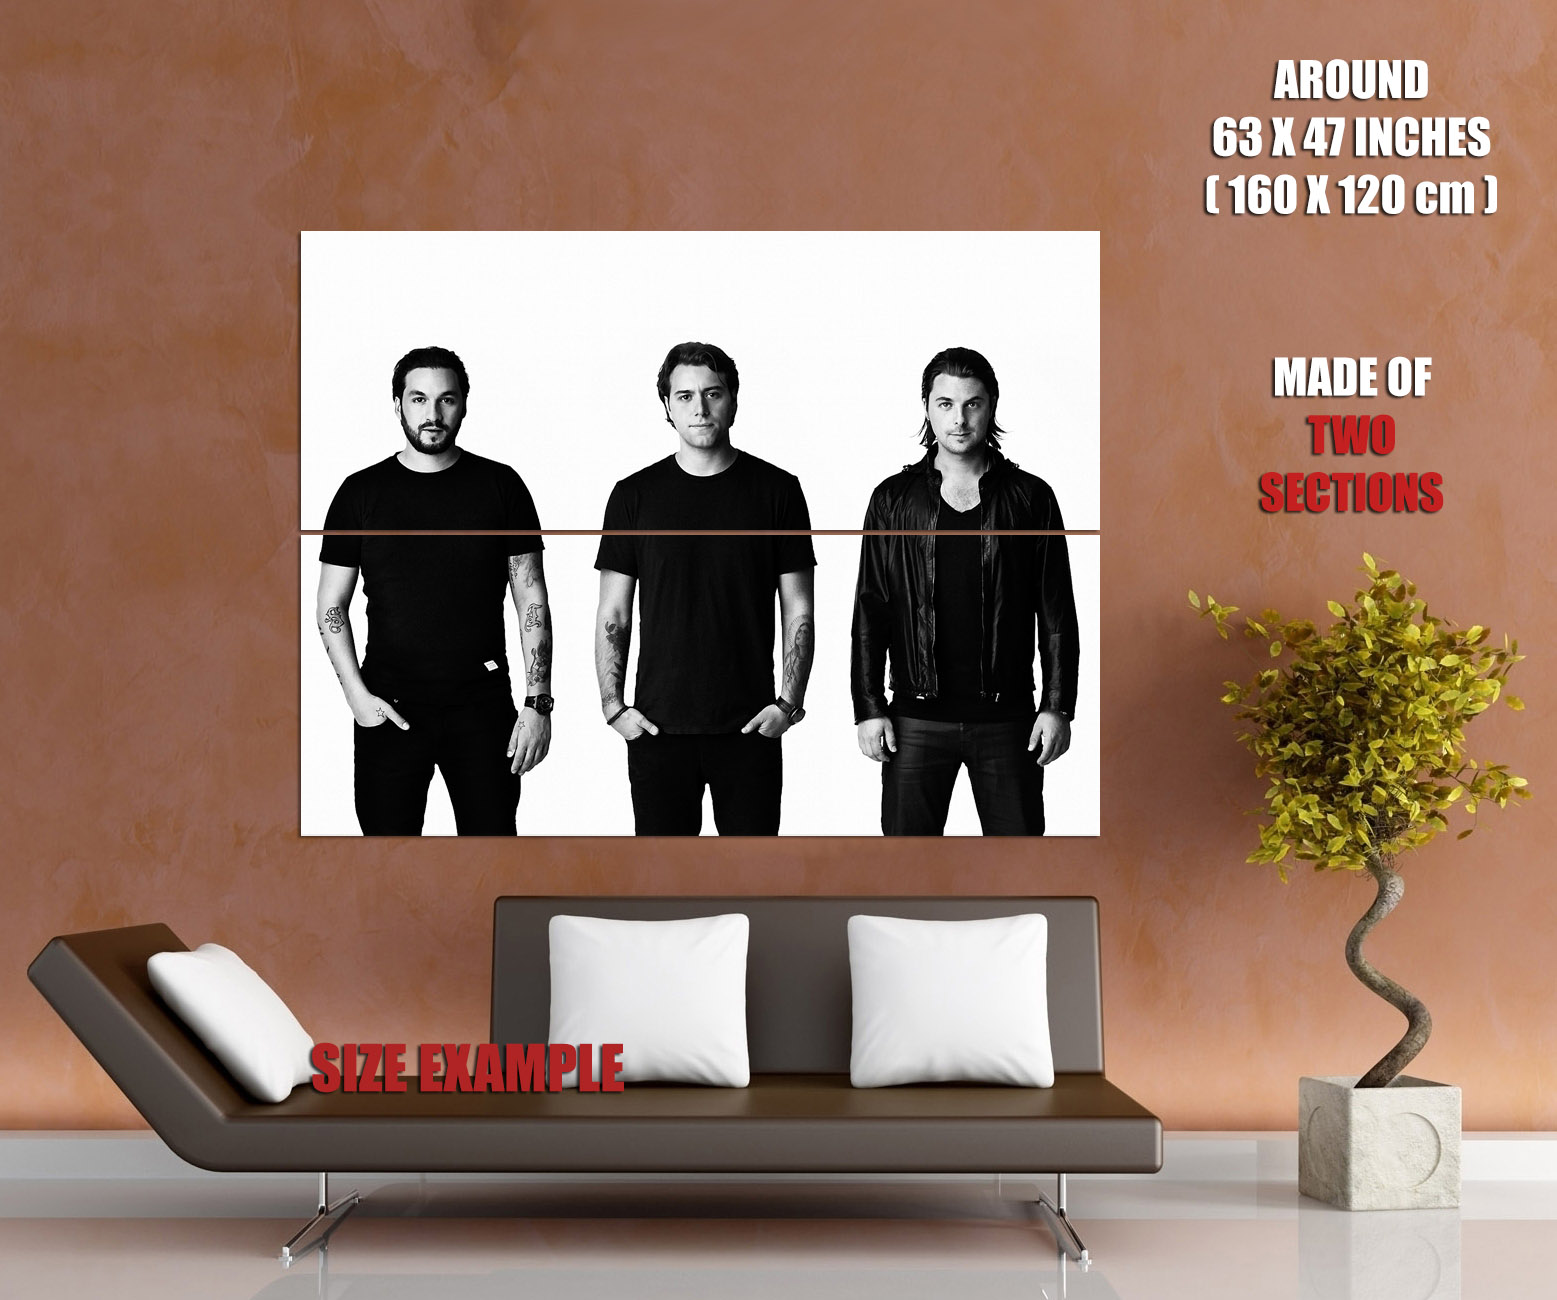 SHM-Swedish-House-Mafia-electronic-dance-music-Wall-Print-POSTER-FR miniature 6